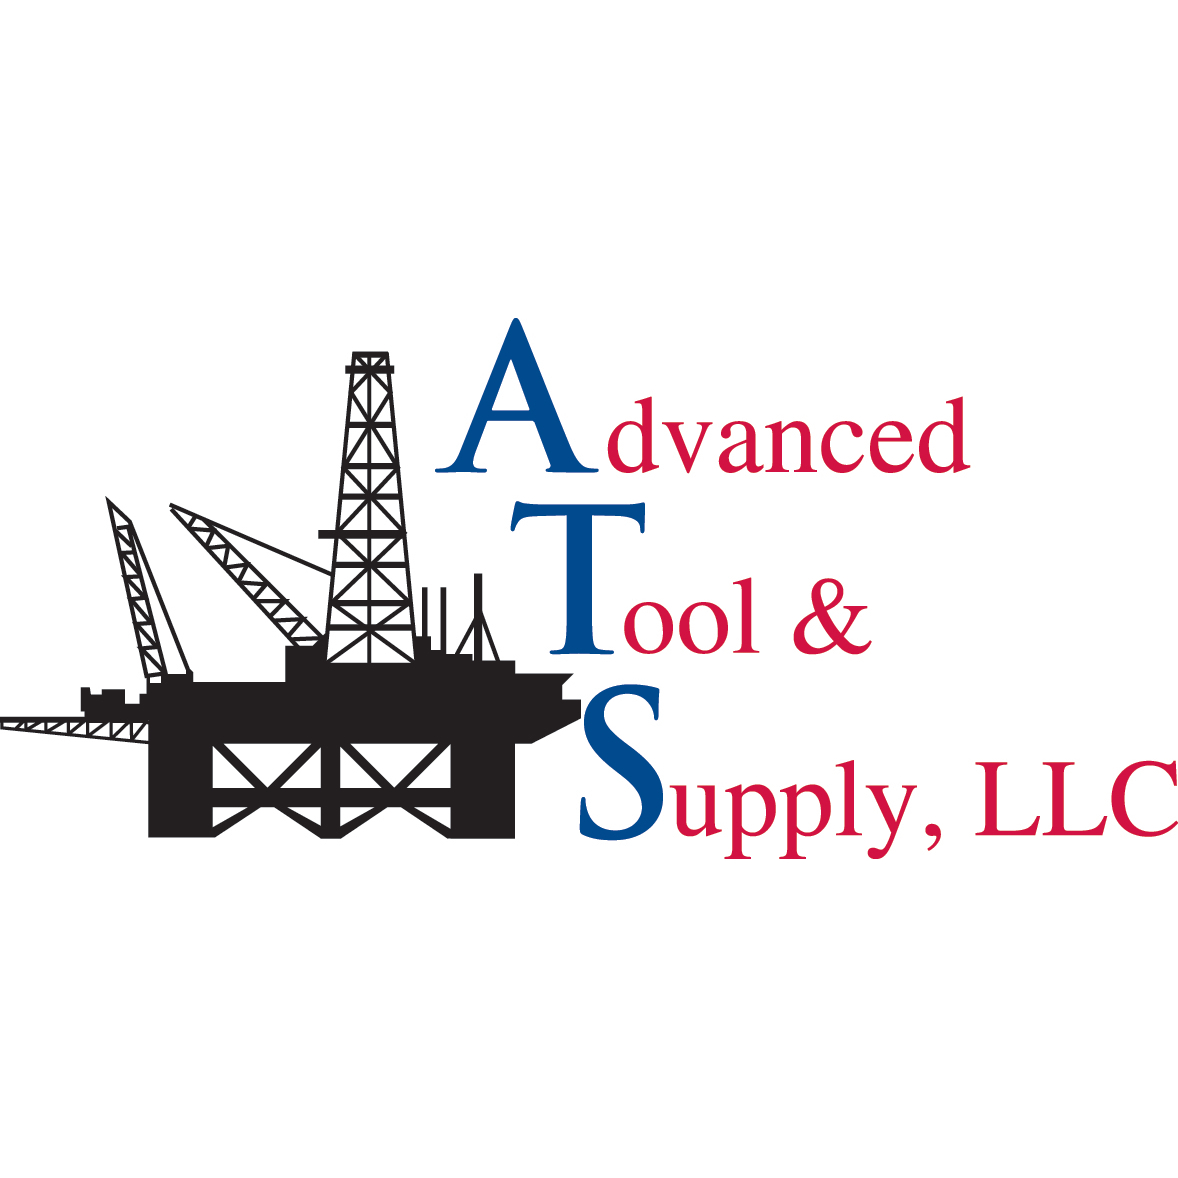 Advanced Tool & Supply, LLC